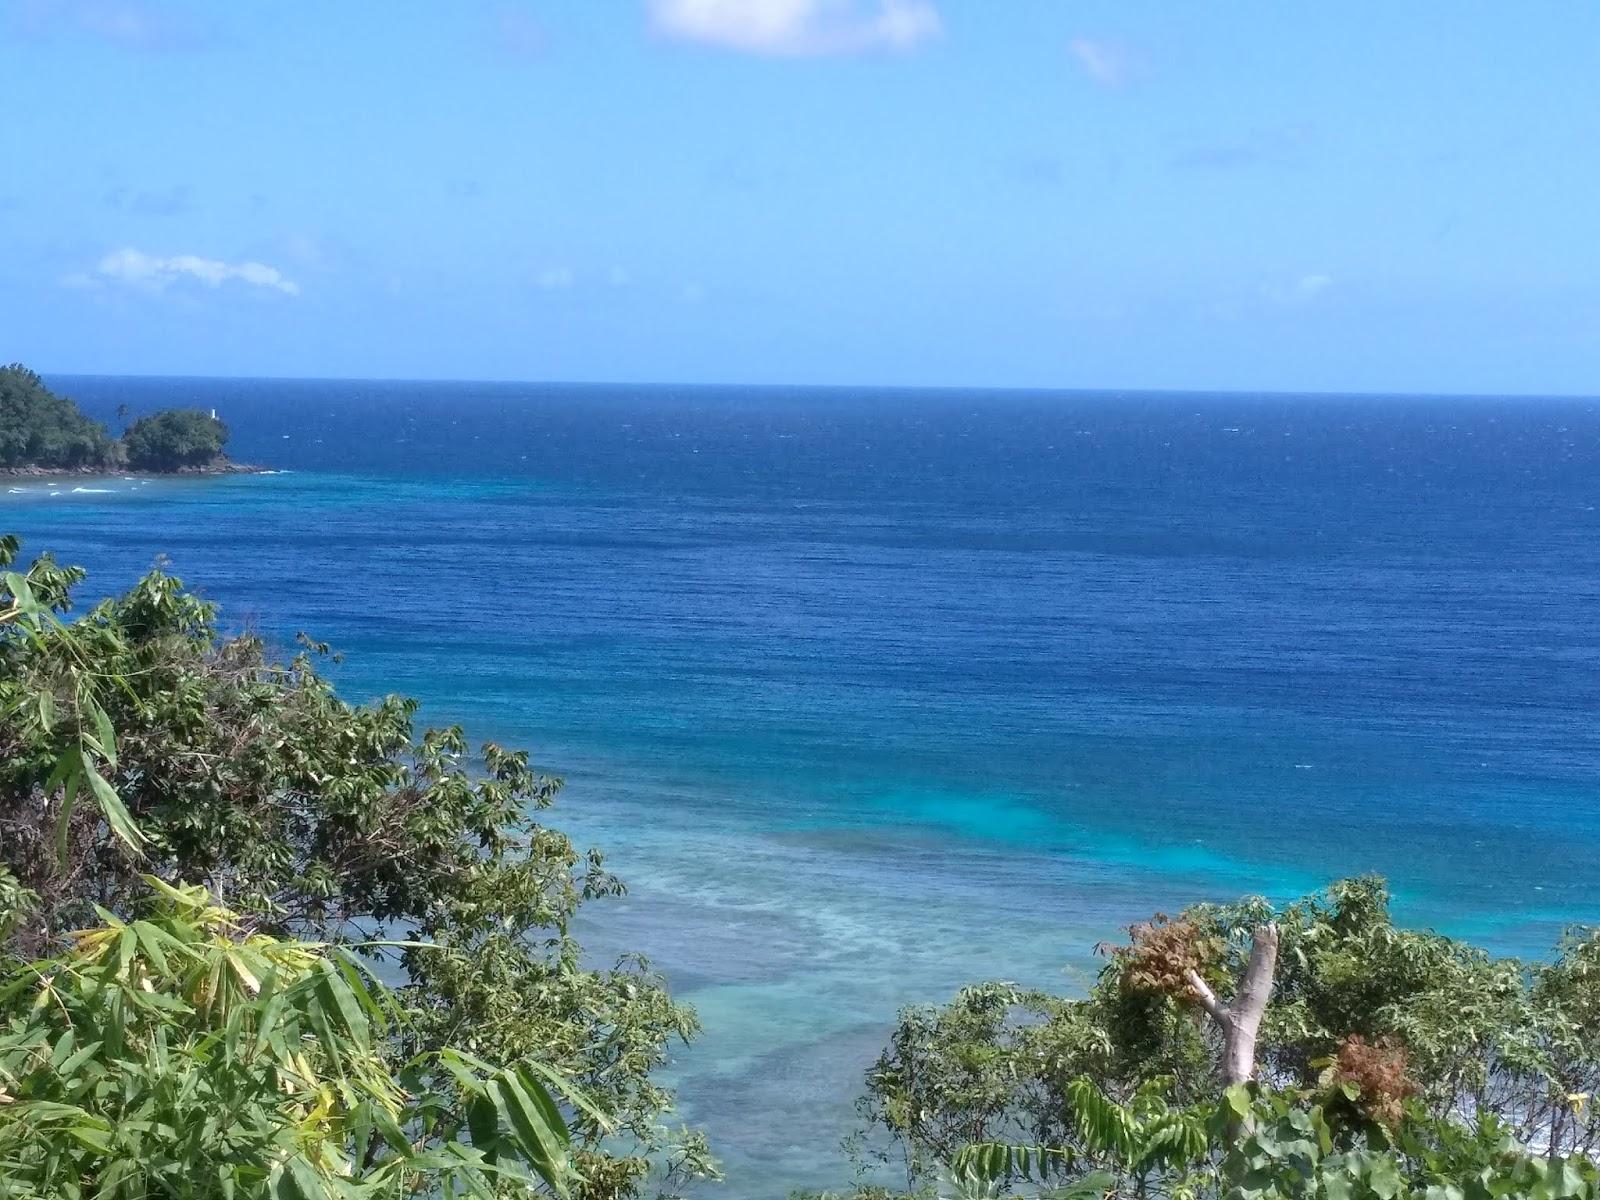 Primadona Kampung Barangkalang Sangihe Wisata Sangihe Sangihe Tourism Stevenly Takapaha